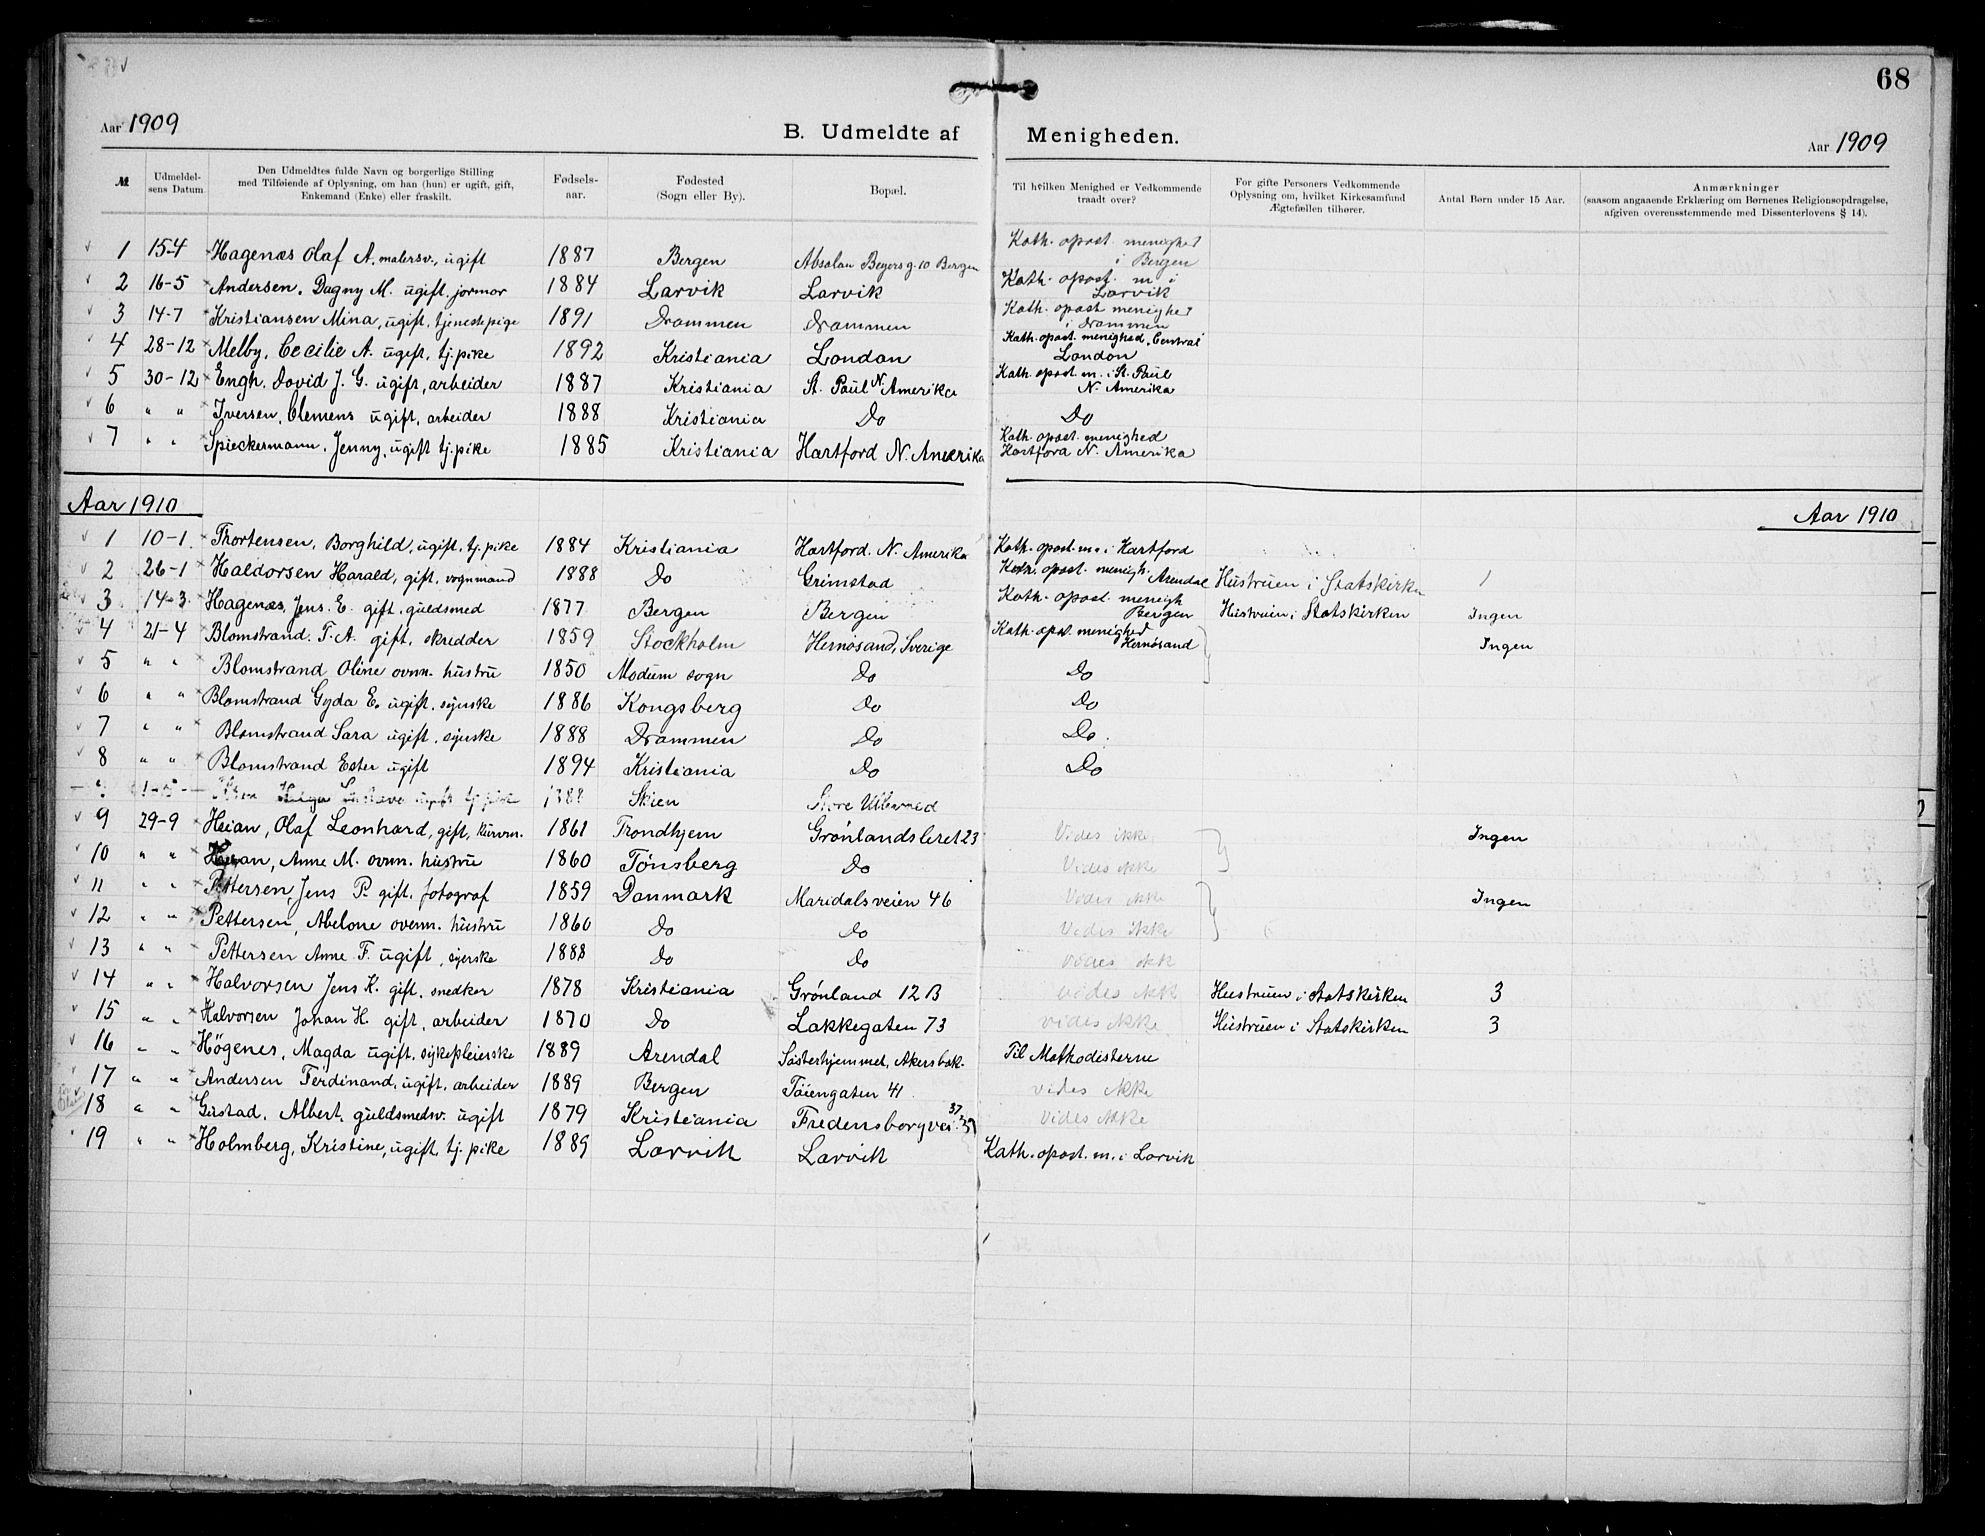 SAO, Den katolsk apostoliske menighet i Oslo , F/Fa/L0002: Dissenterprotokoll nr. 2, 1892-1937, s. 68